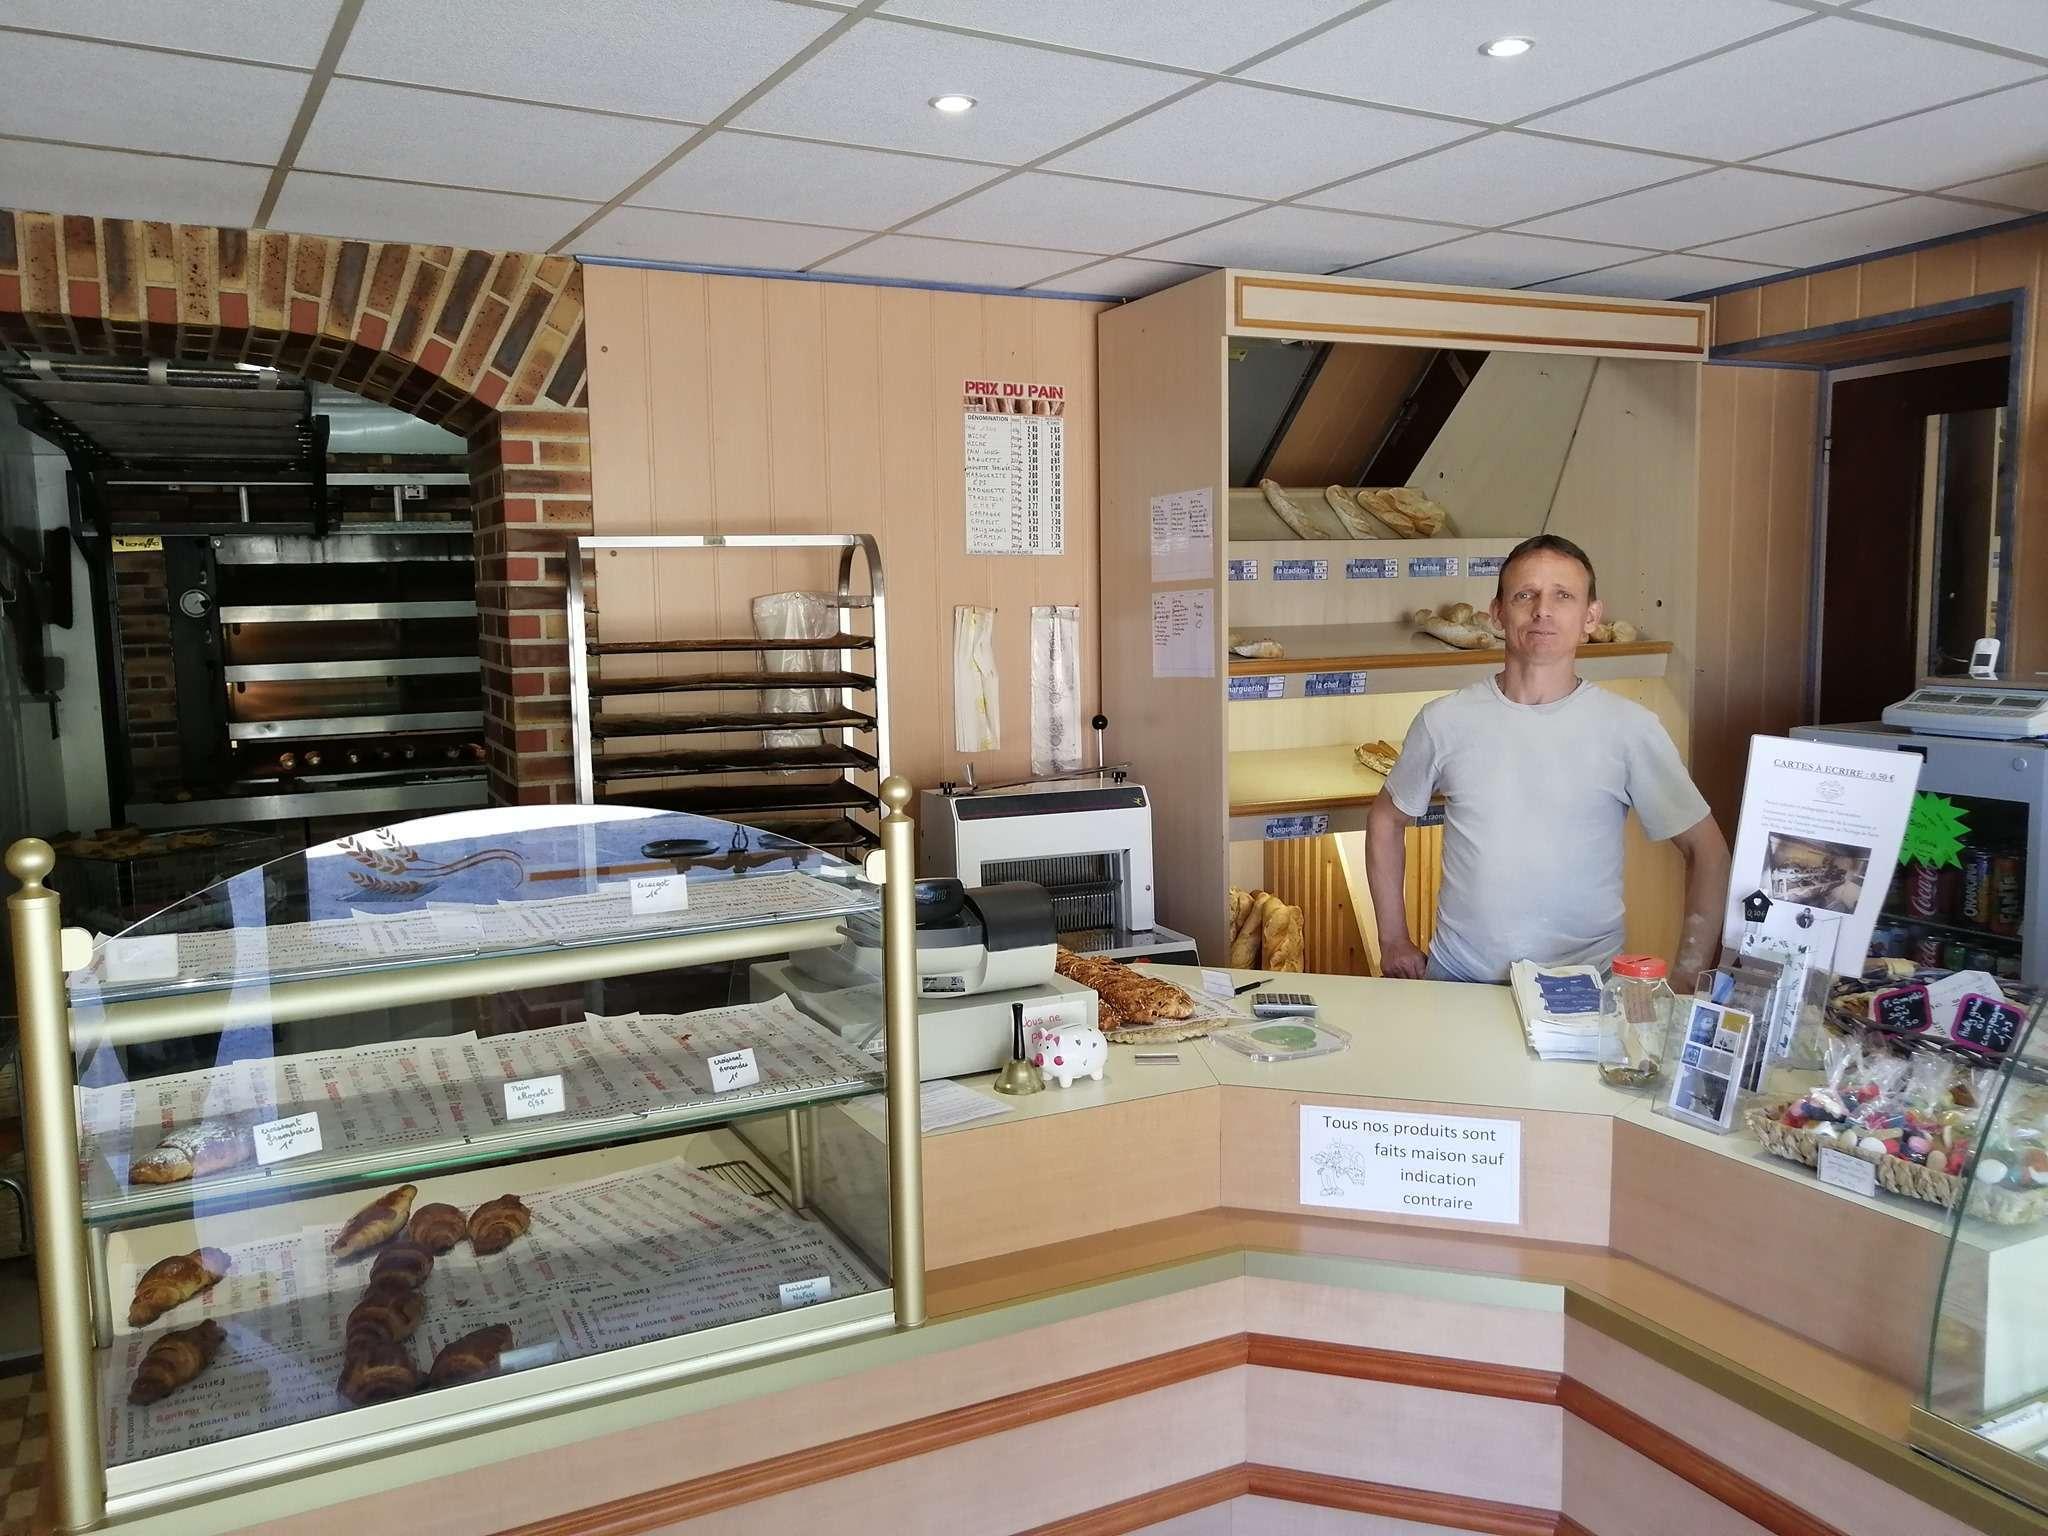 Boulangerie BEGEL Stéphane